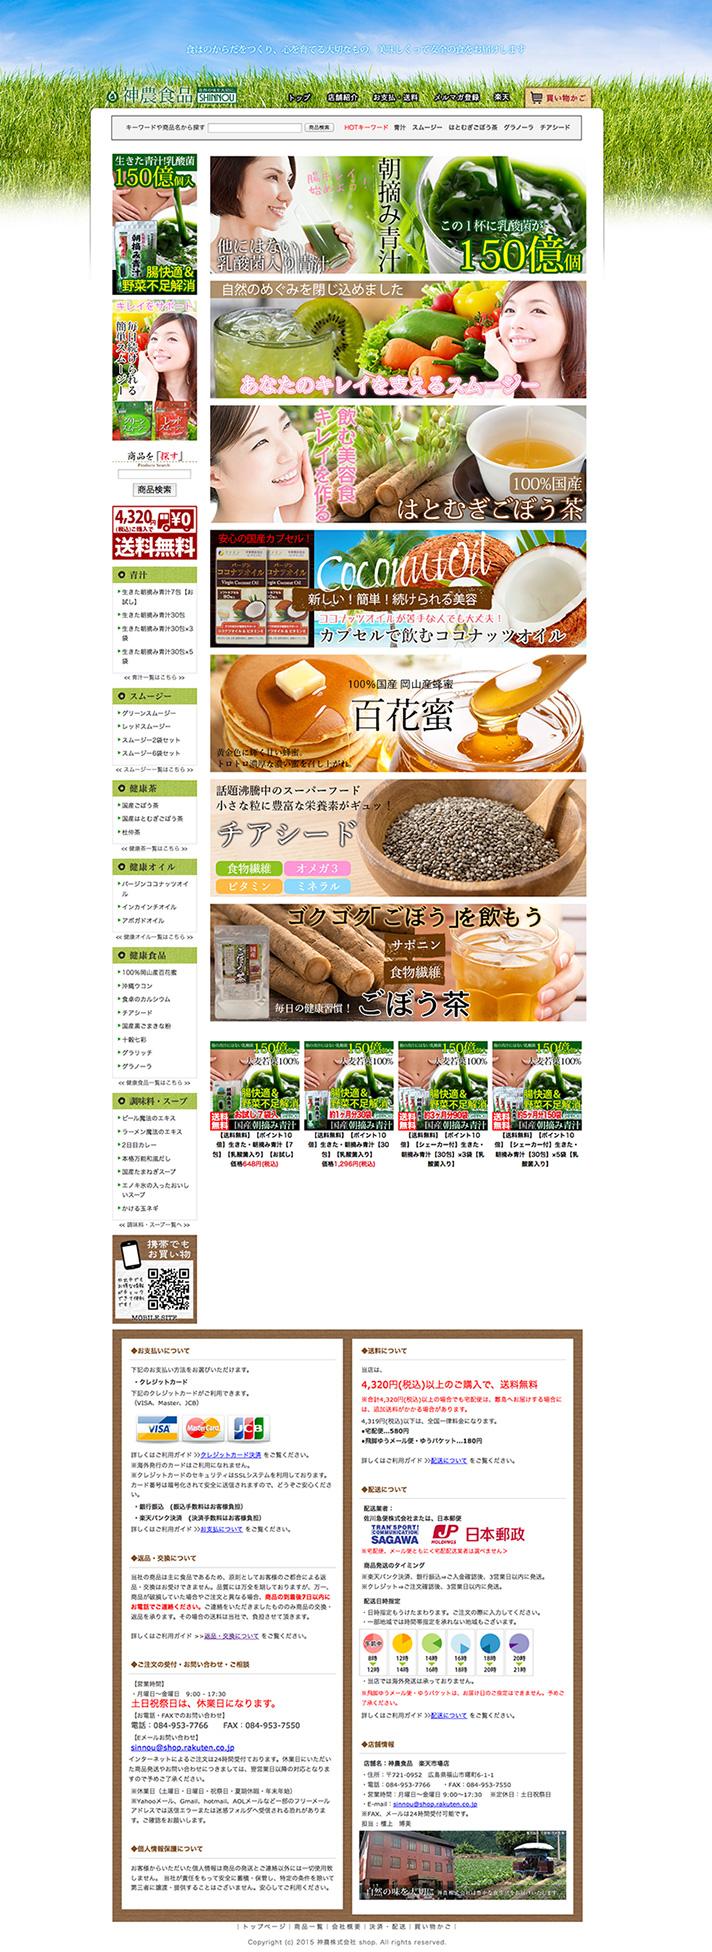 健康食品系楽天市場、楽天ショップ新規出店